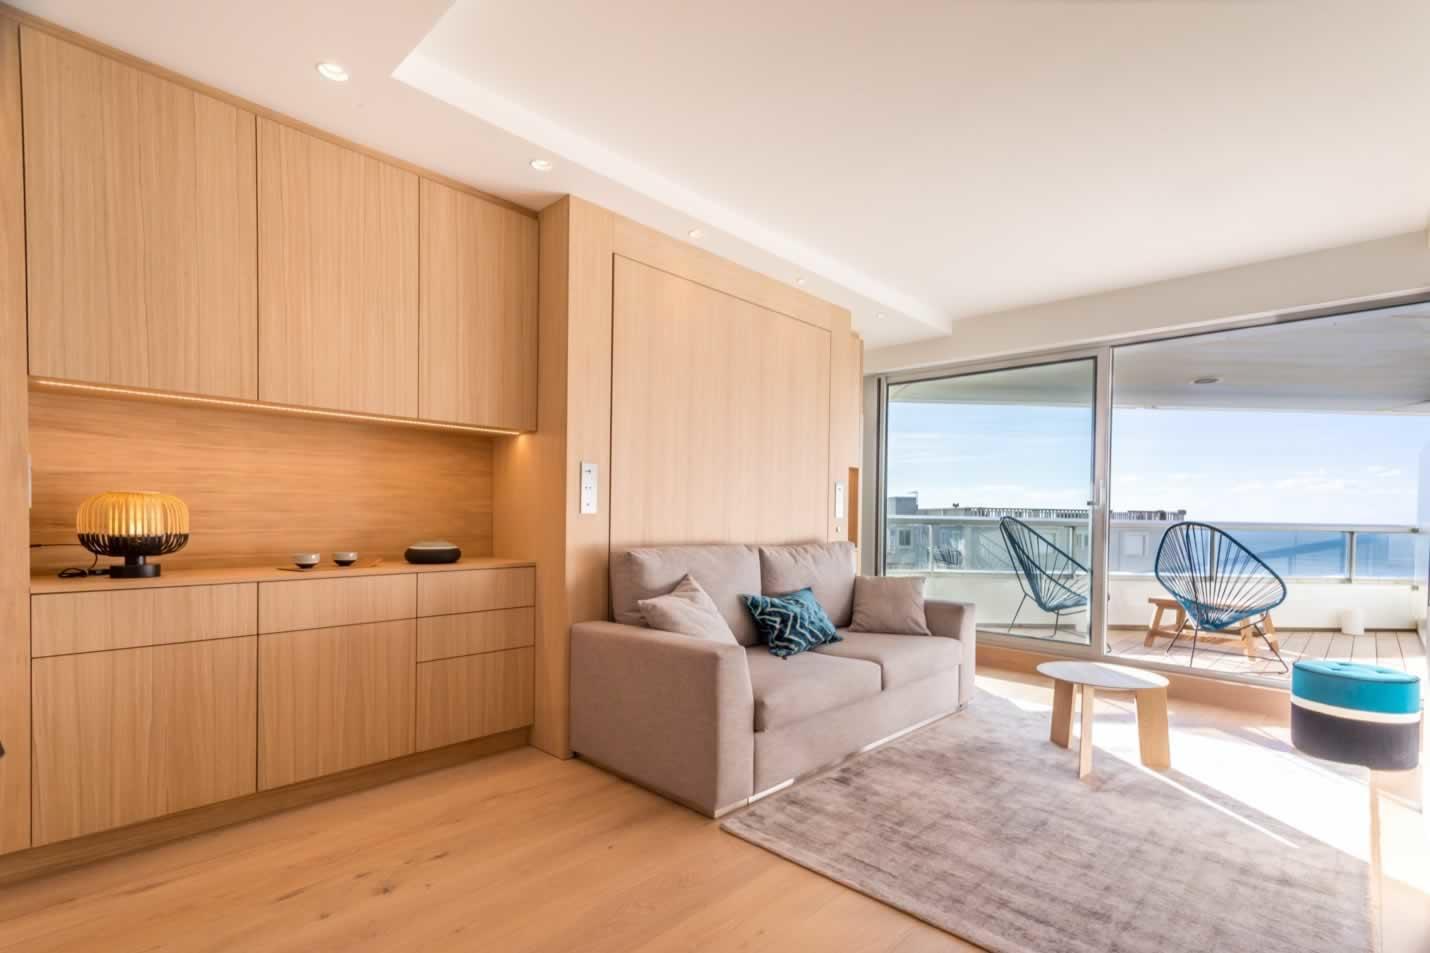 magnifiquement-studio-renove-a-louer-biarritz-miramar-meubles-de-grand-standing-belle-terrasse-vue-imprenable-mer